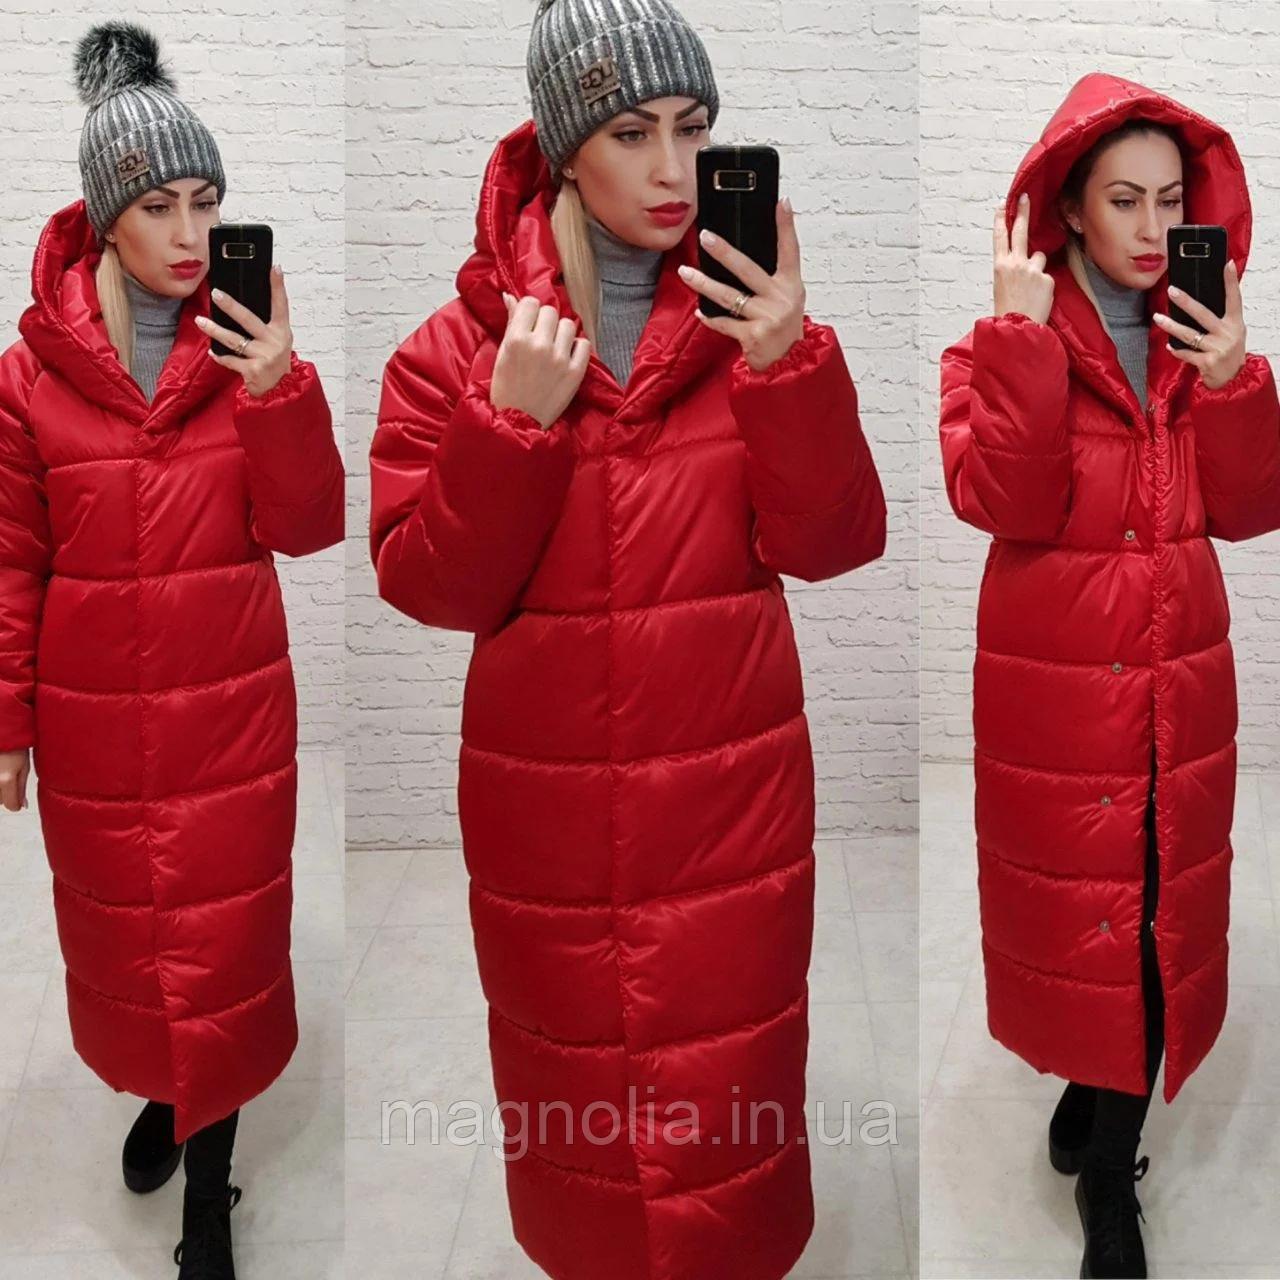 Длинная теплая зимняя куртка пальто пуховик оверсайз кокон одеяло плащевка + силикон 58-60